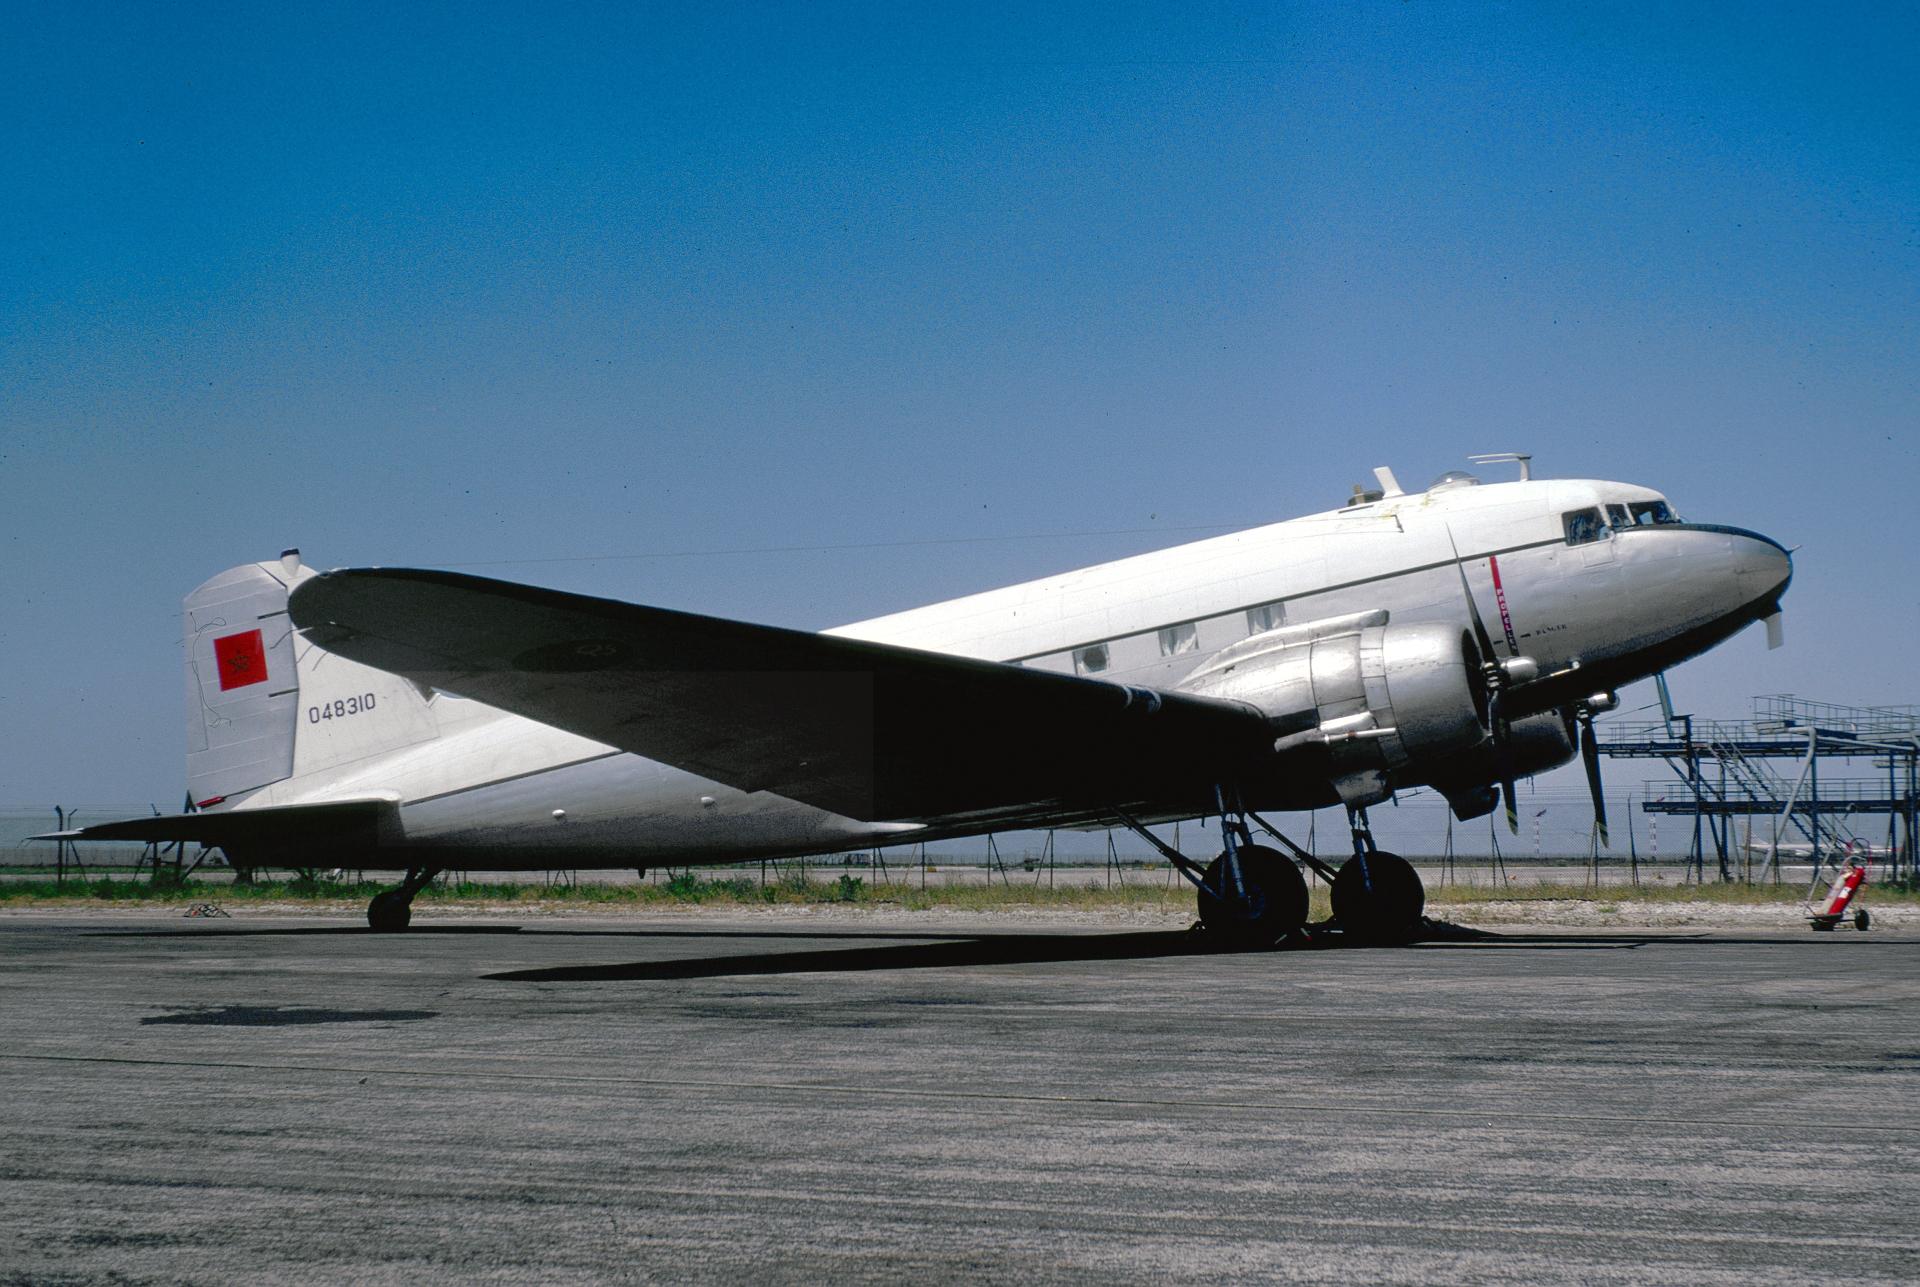 FRA: Photos anciens avions des FRA - Page 7 151220044011929753